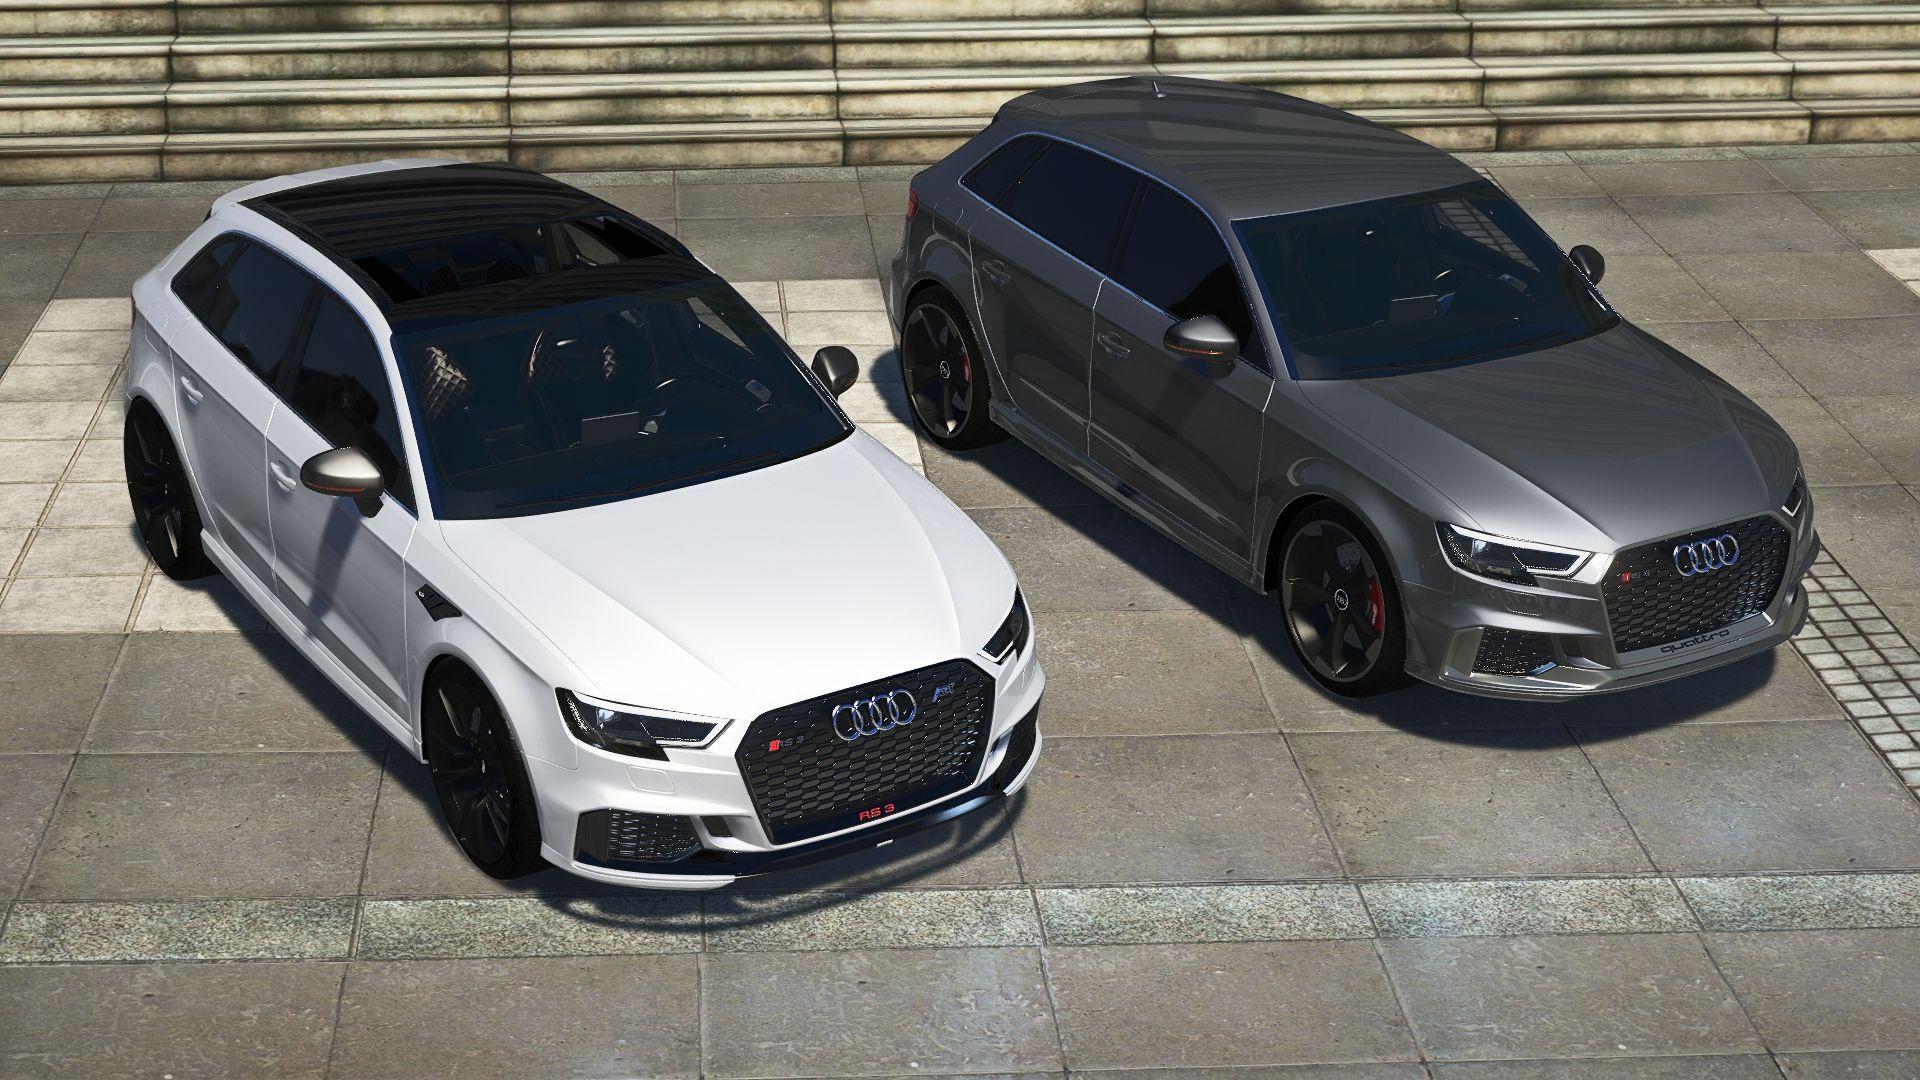 Audi RS3 Sportback 2018 [Add-on/Tuning+wheel-ABT] - GTA5